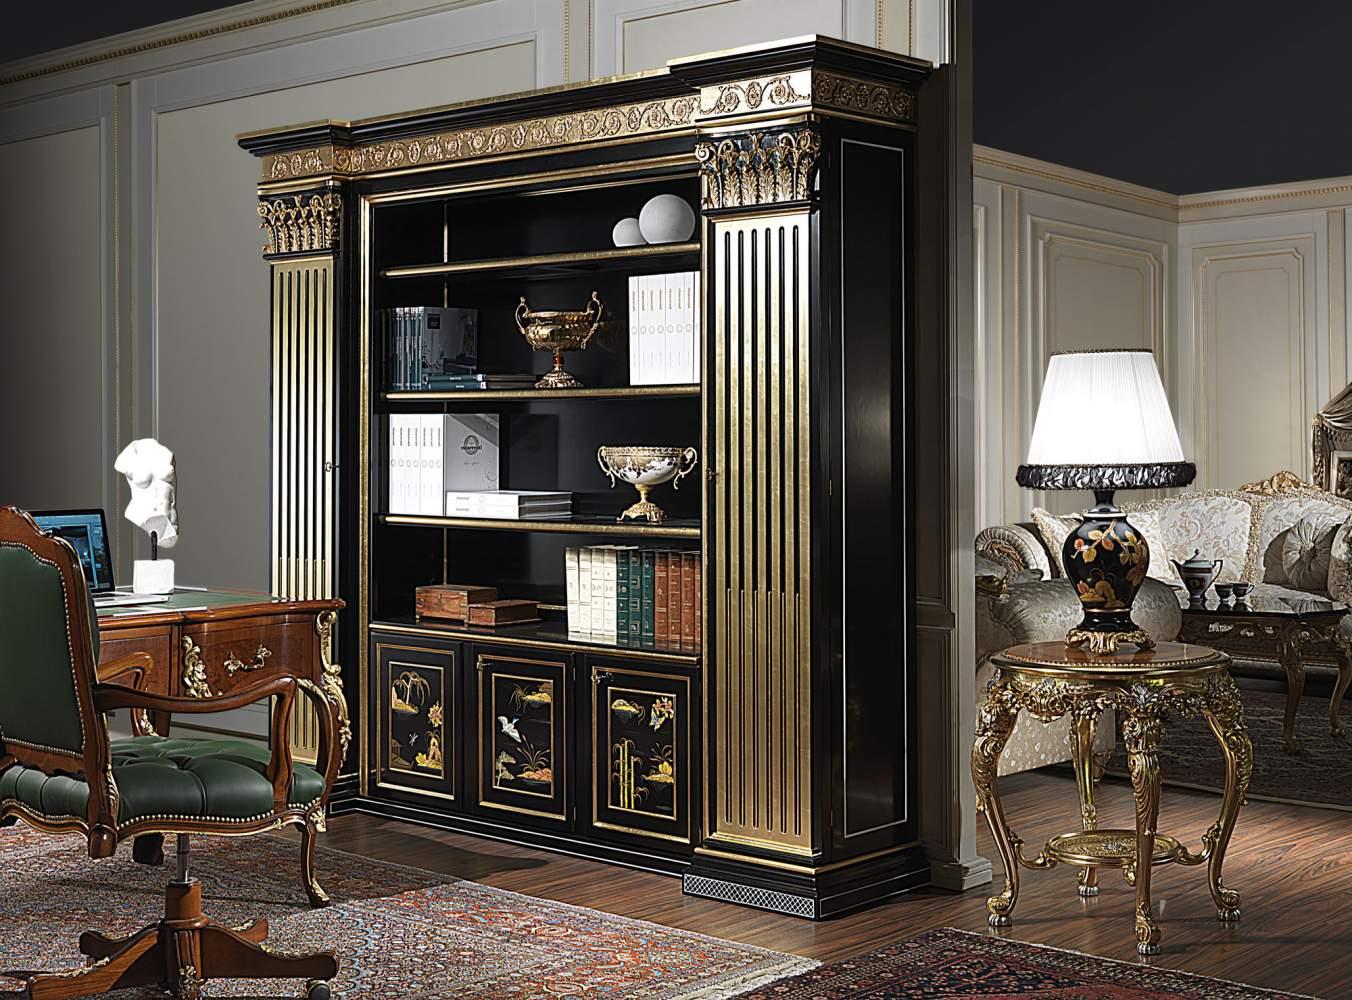 Libreria Luigi XV Chinoiserie art.91/3